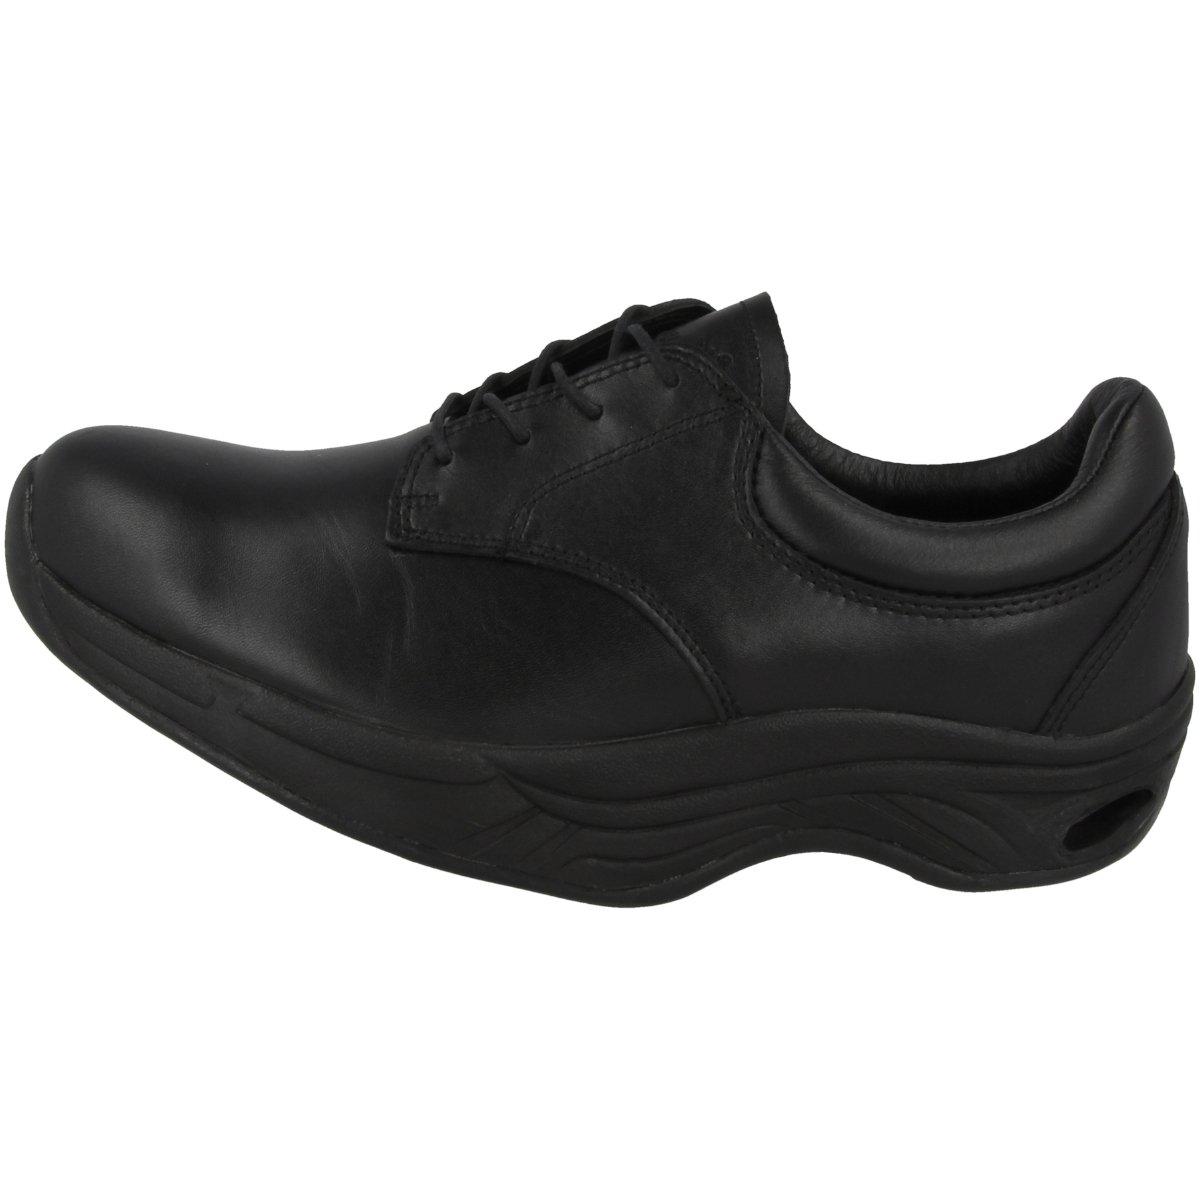 Chung Shi scarpe Comfort Step Carol nero (9102315) 38,5 nero